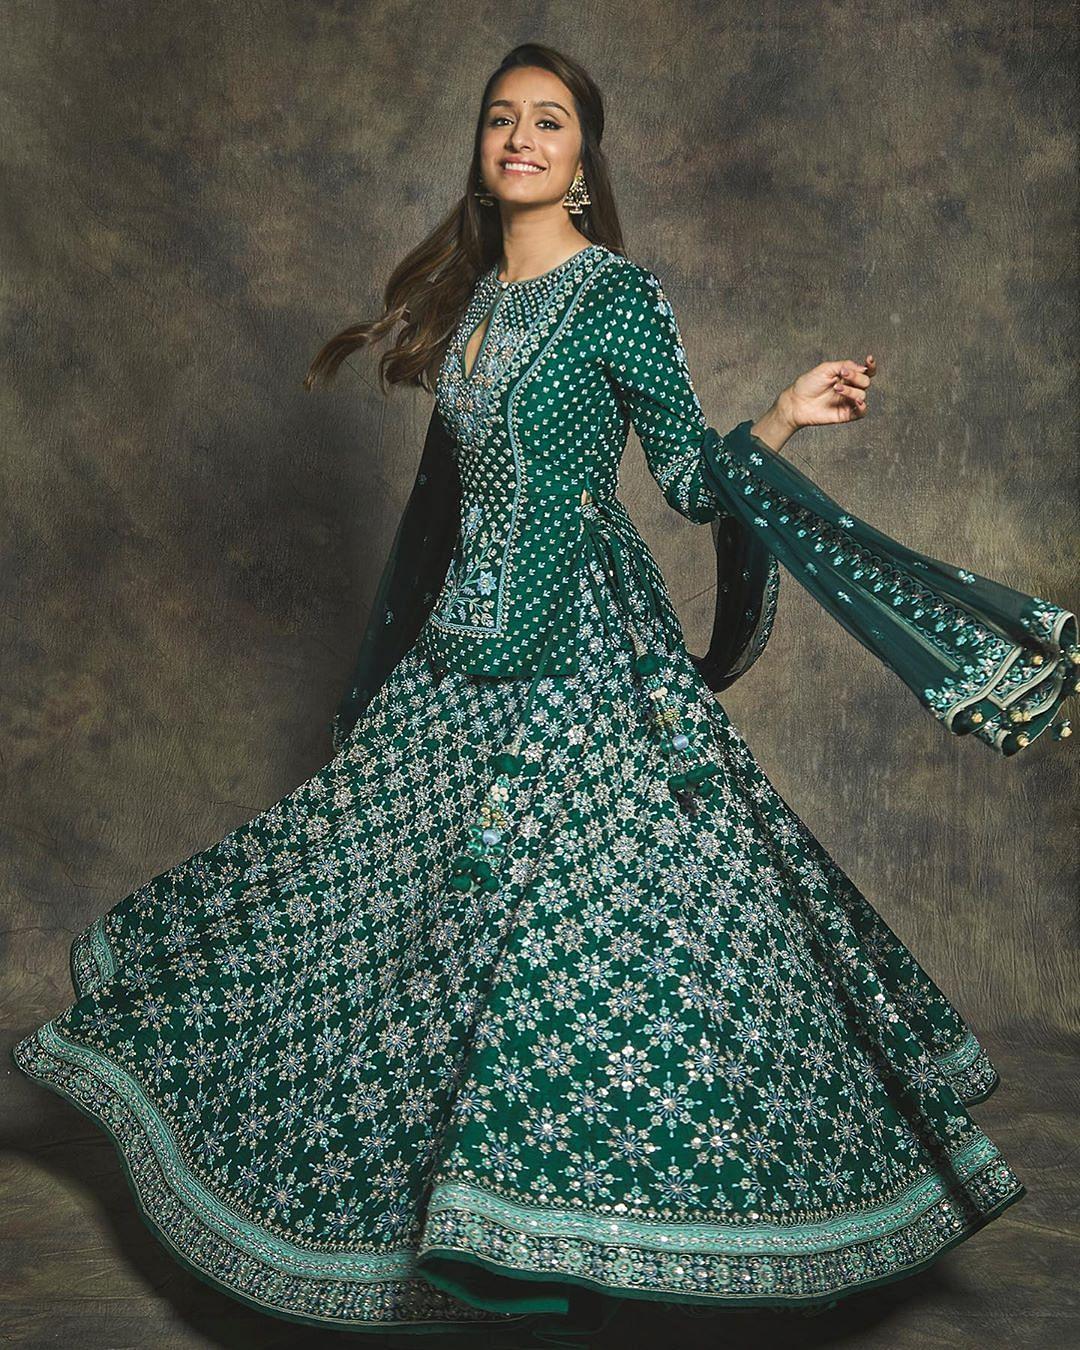 Happy Birthday Shraddha Kapoor - A sneak peek into the B-town star's fashion lookbook